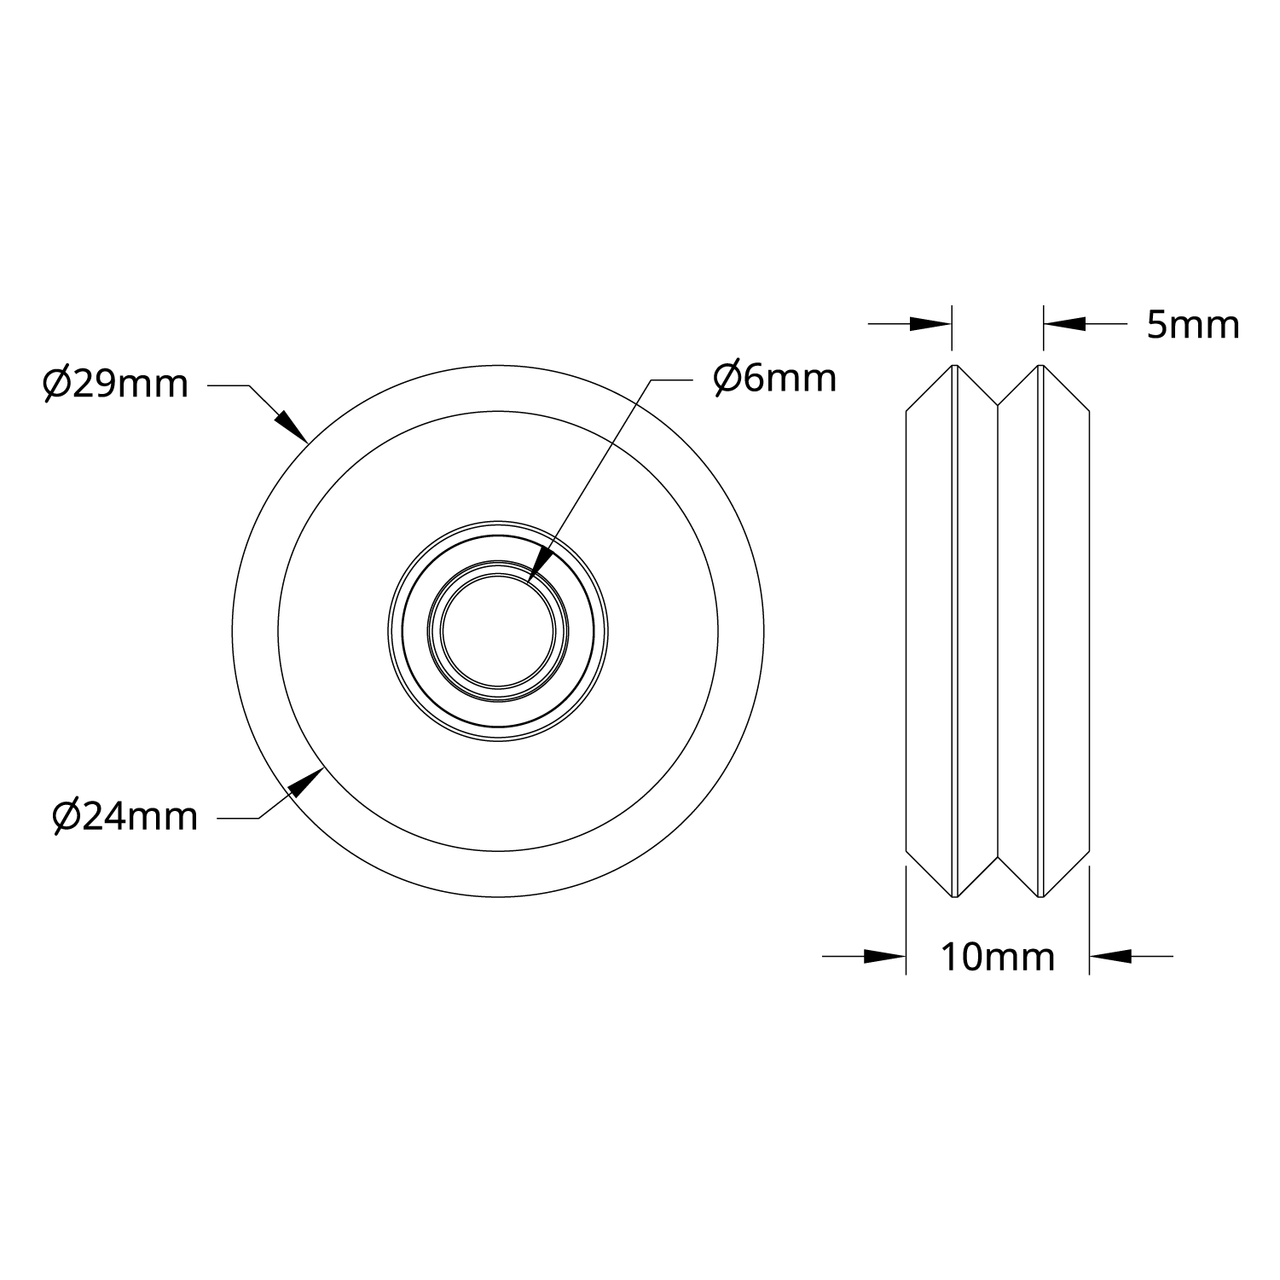 29mm 3600 0006 2910 schematic [ 1280 x 1280 Pixel ]